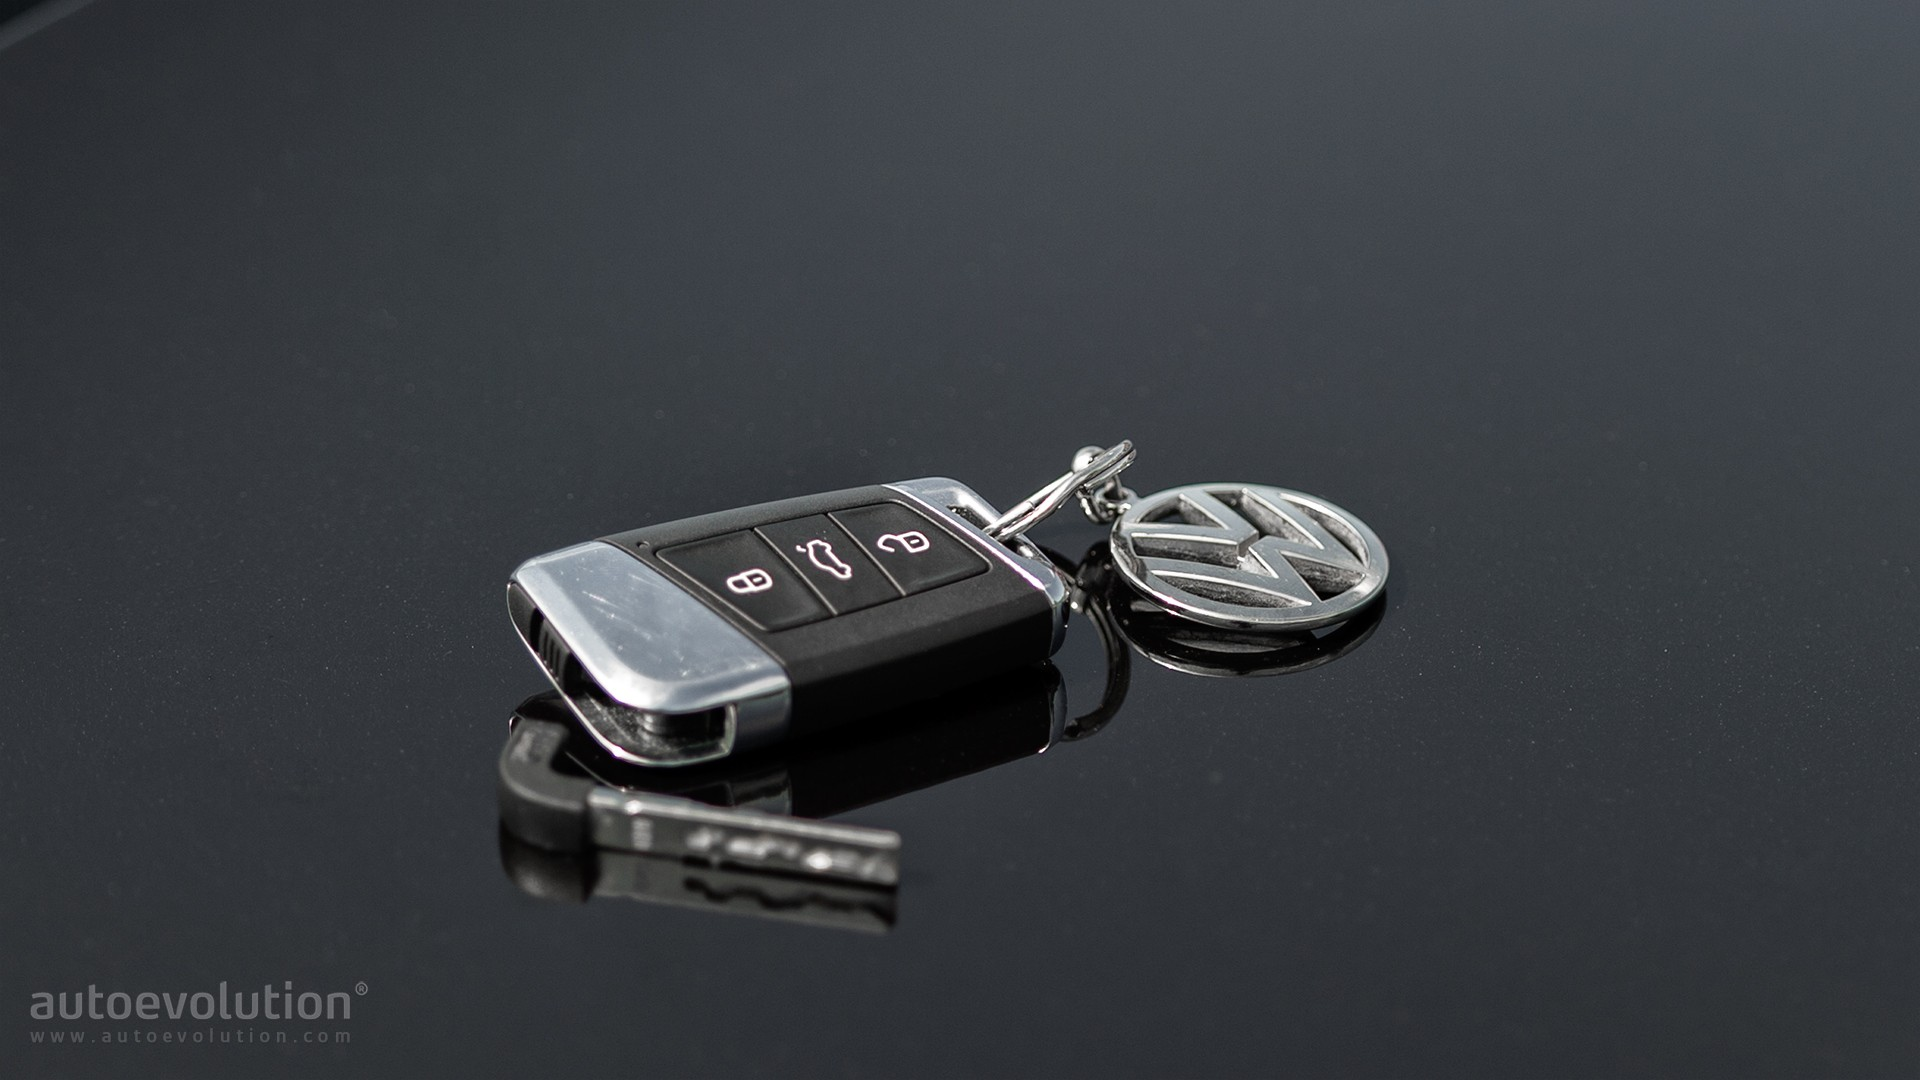 FTC Wallops Audi Volkswagen Korea With $32 Million Fine for False Advertising - autoevolution